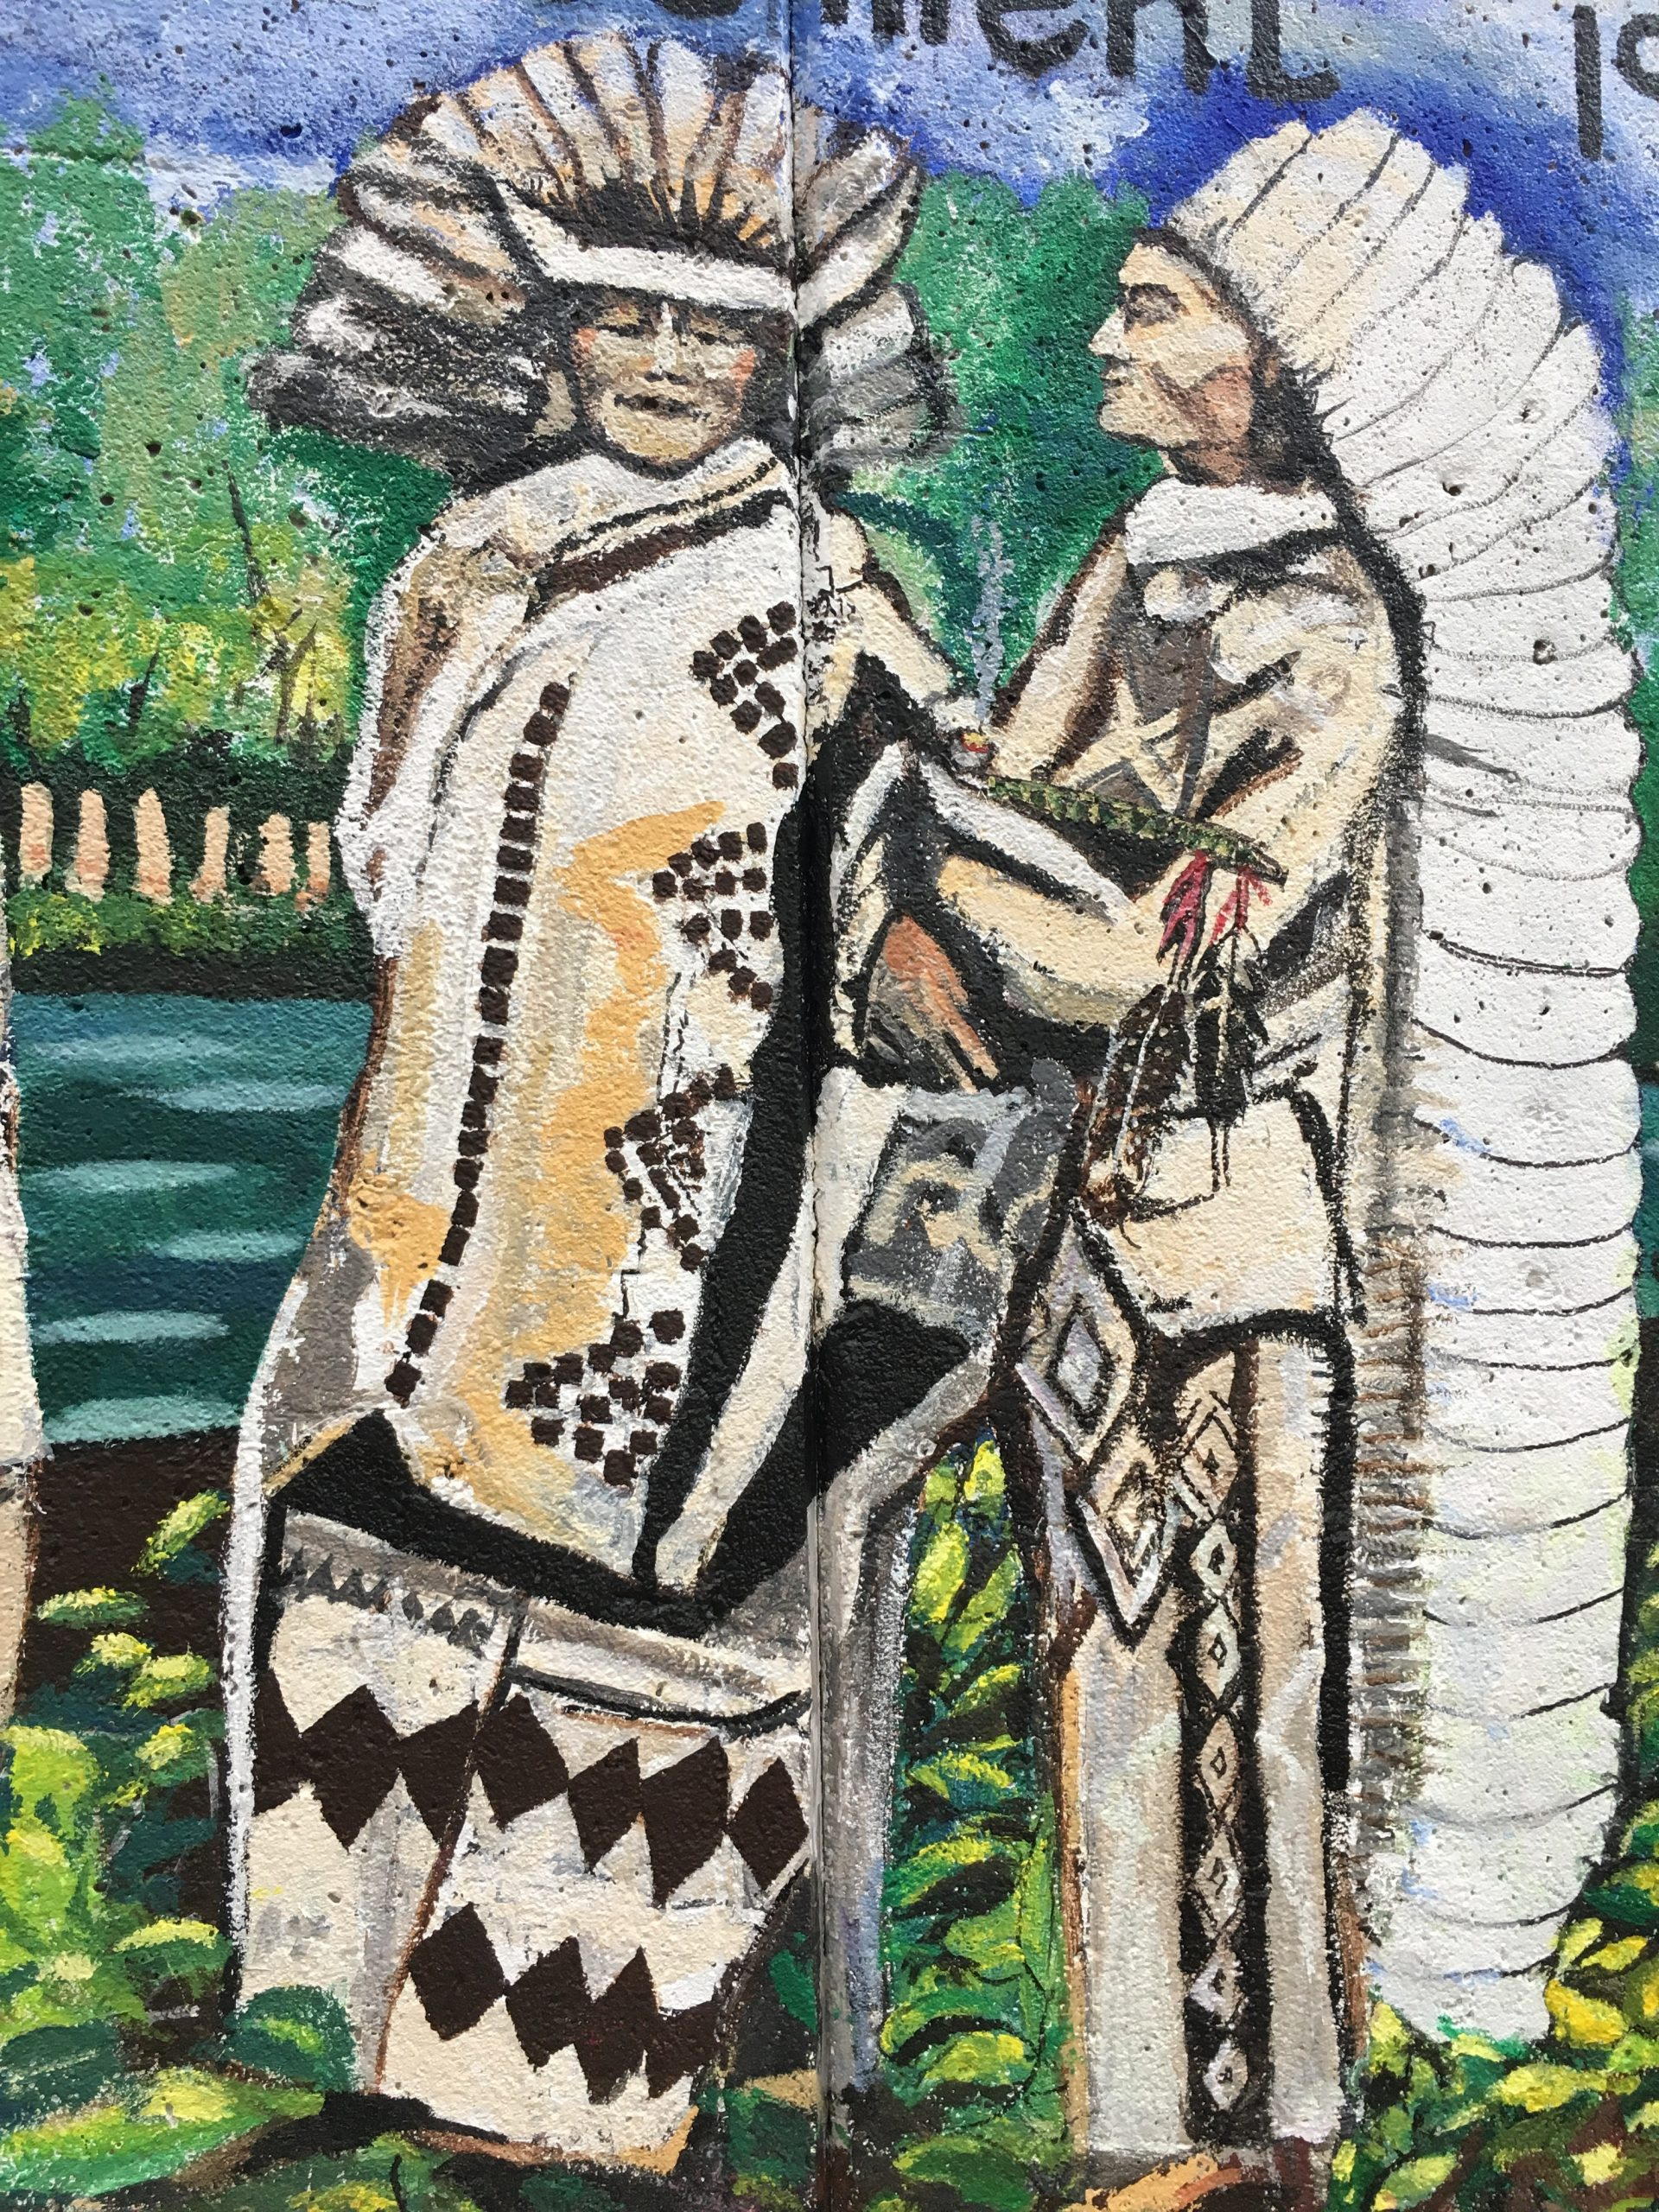 Cypress Street Land Acknowledgement Mural 2019  by Native American Wampanoag Artist  Deborah Spears Moorehead An  Outdoor Painted Mural on a Cement Bridge Wall  14 feet high by 30 feet wide